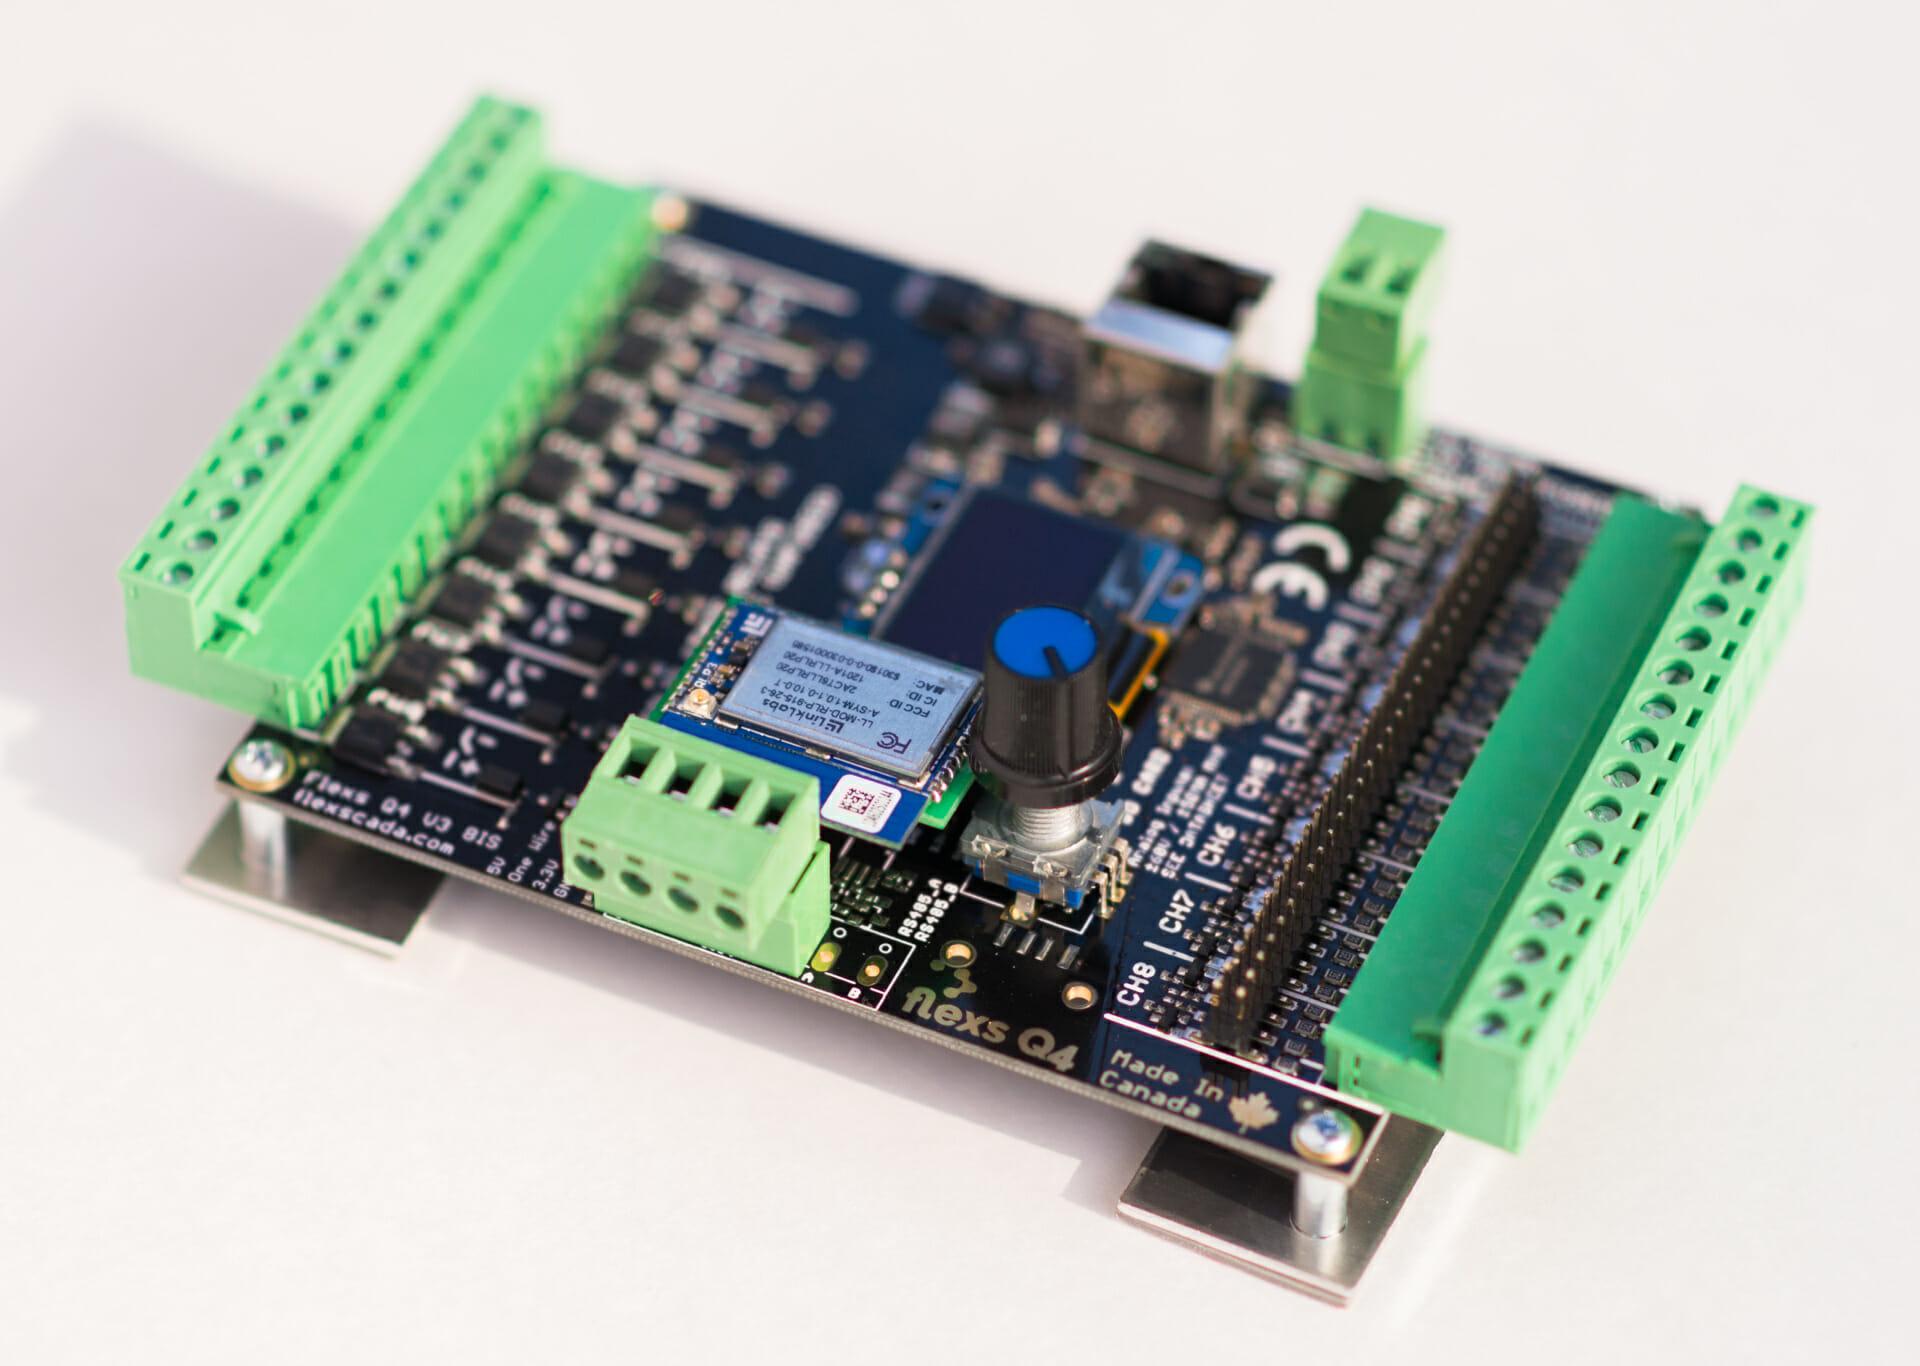 Flexs Q4 + Link Labs LORA radio module